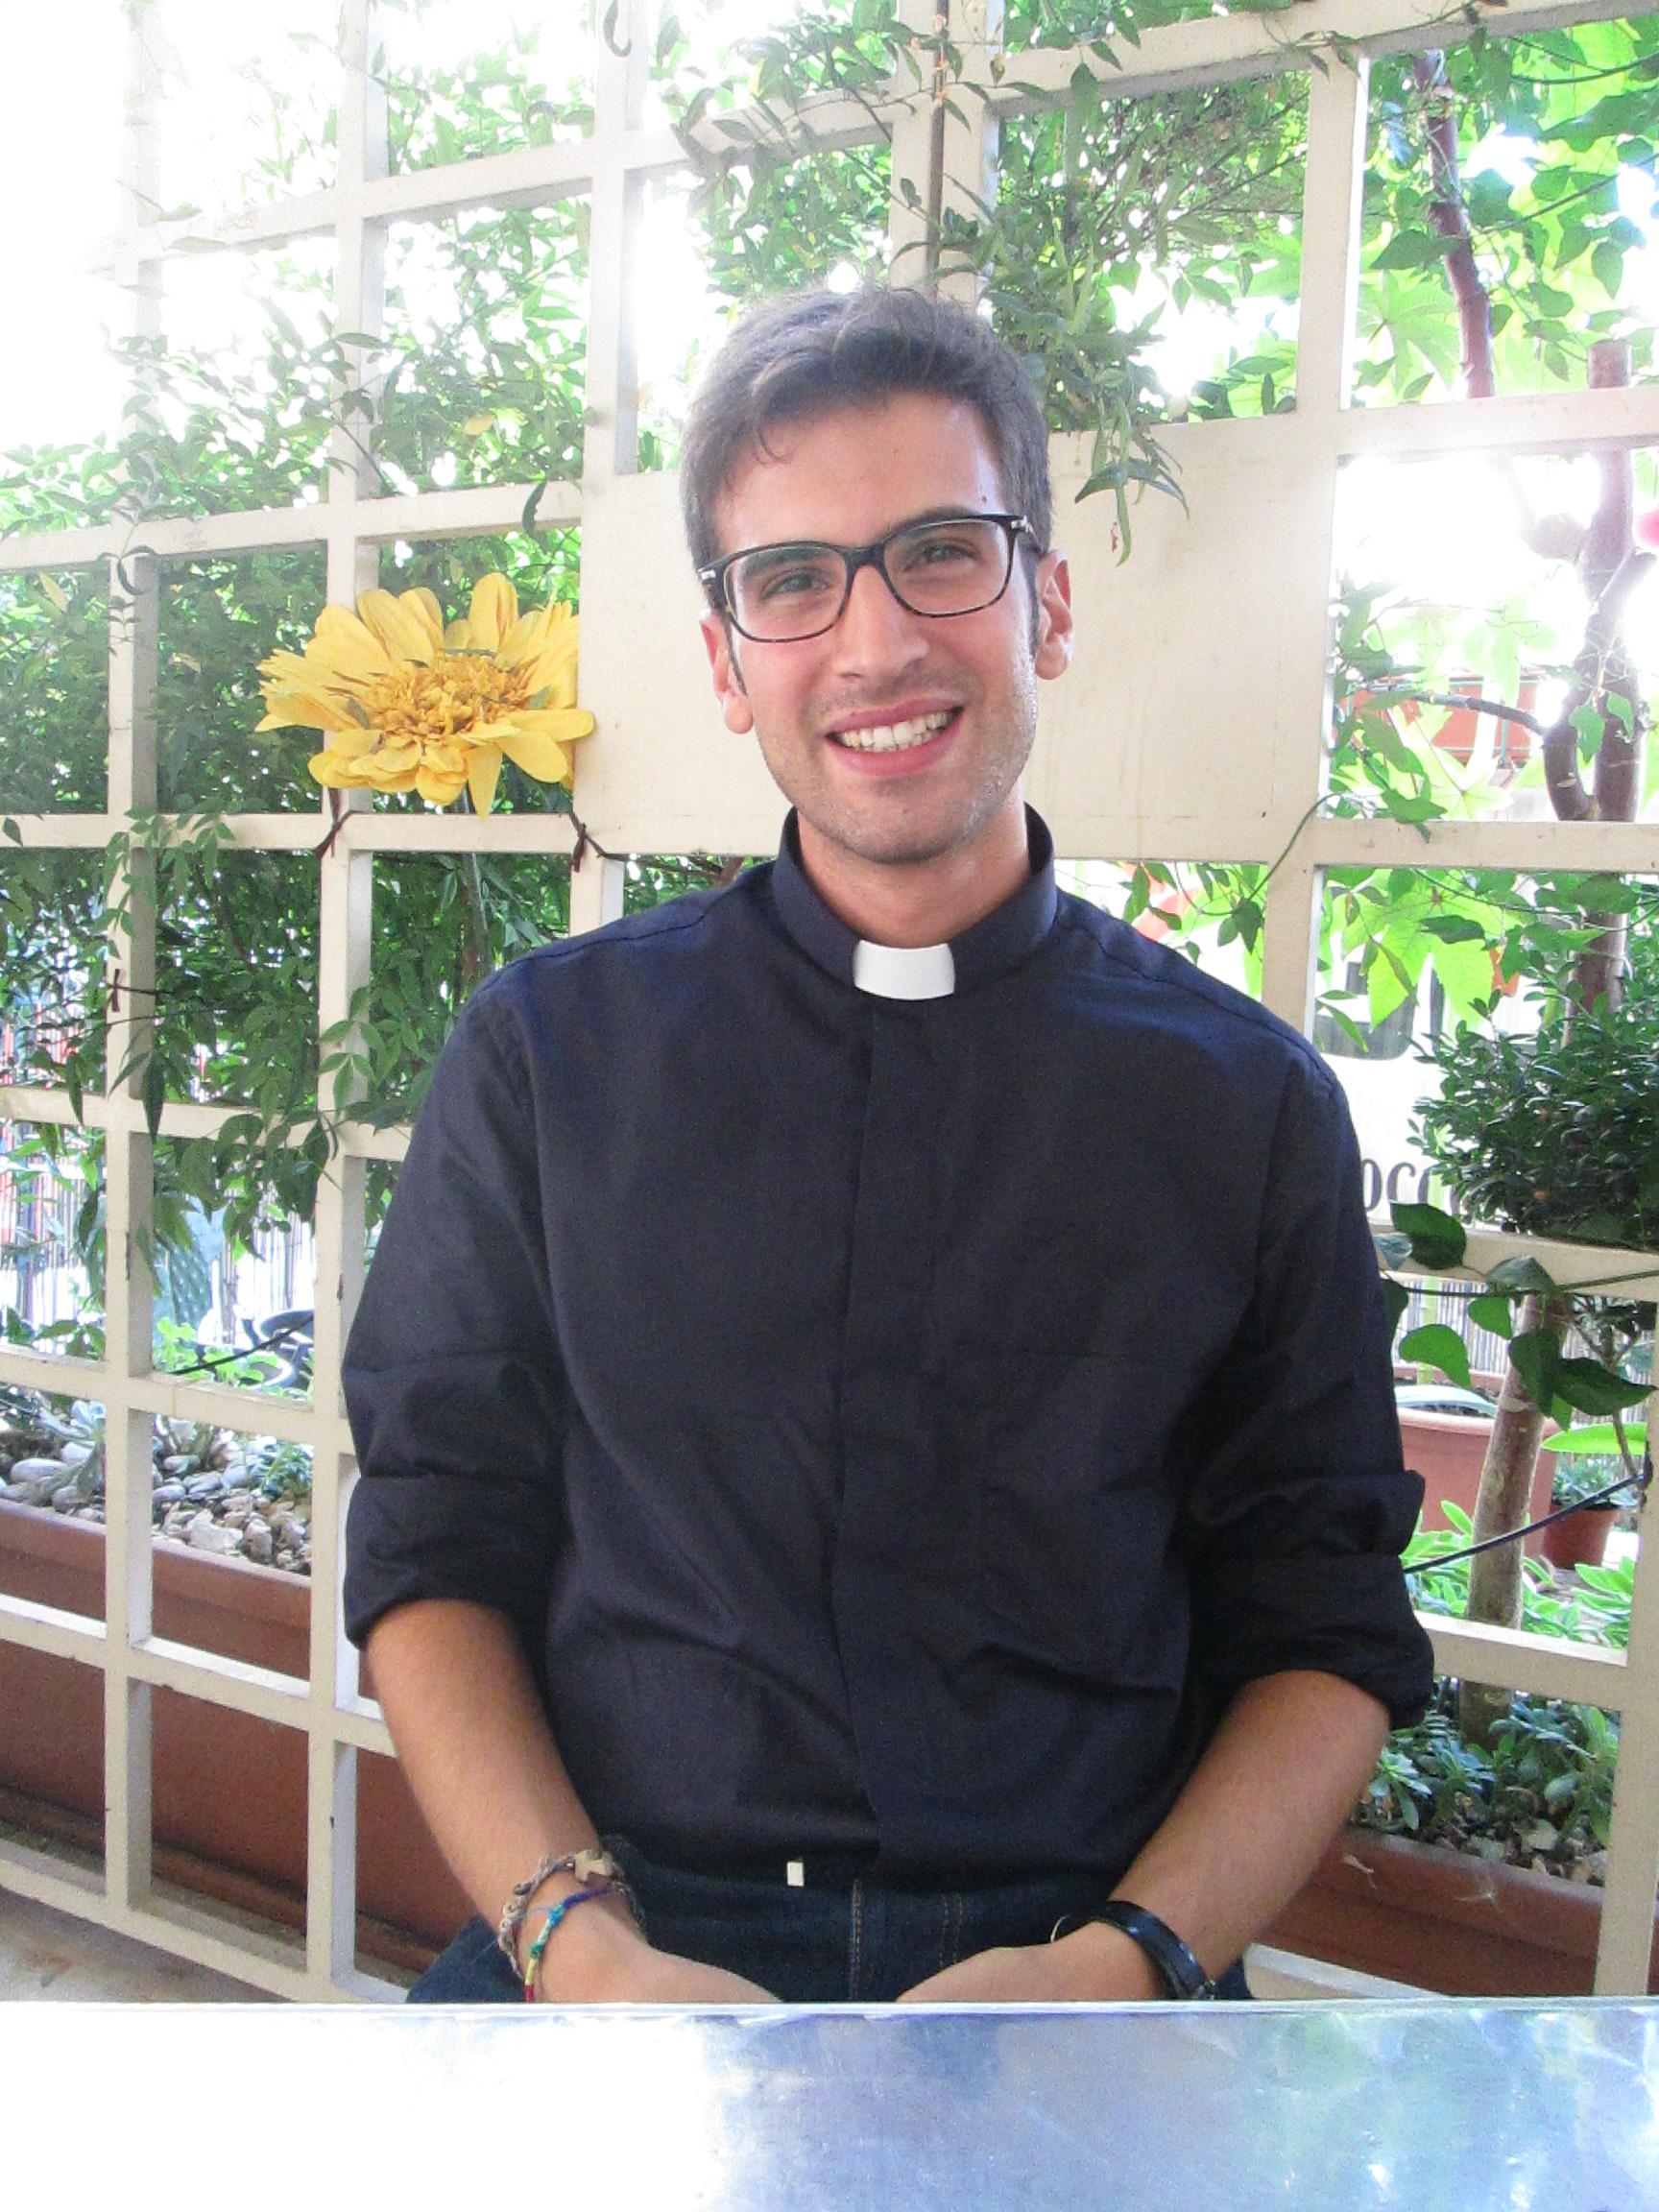 Antonio Giardinelli